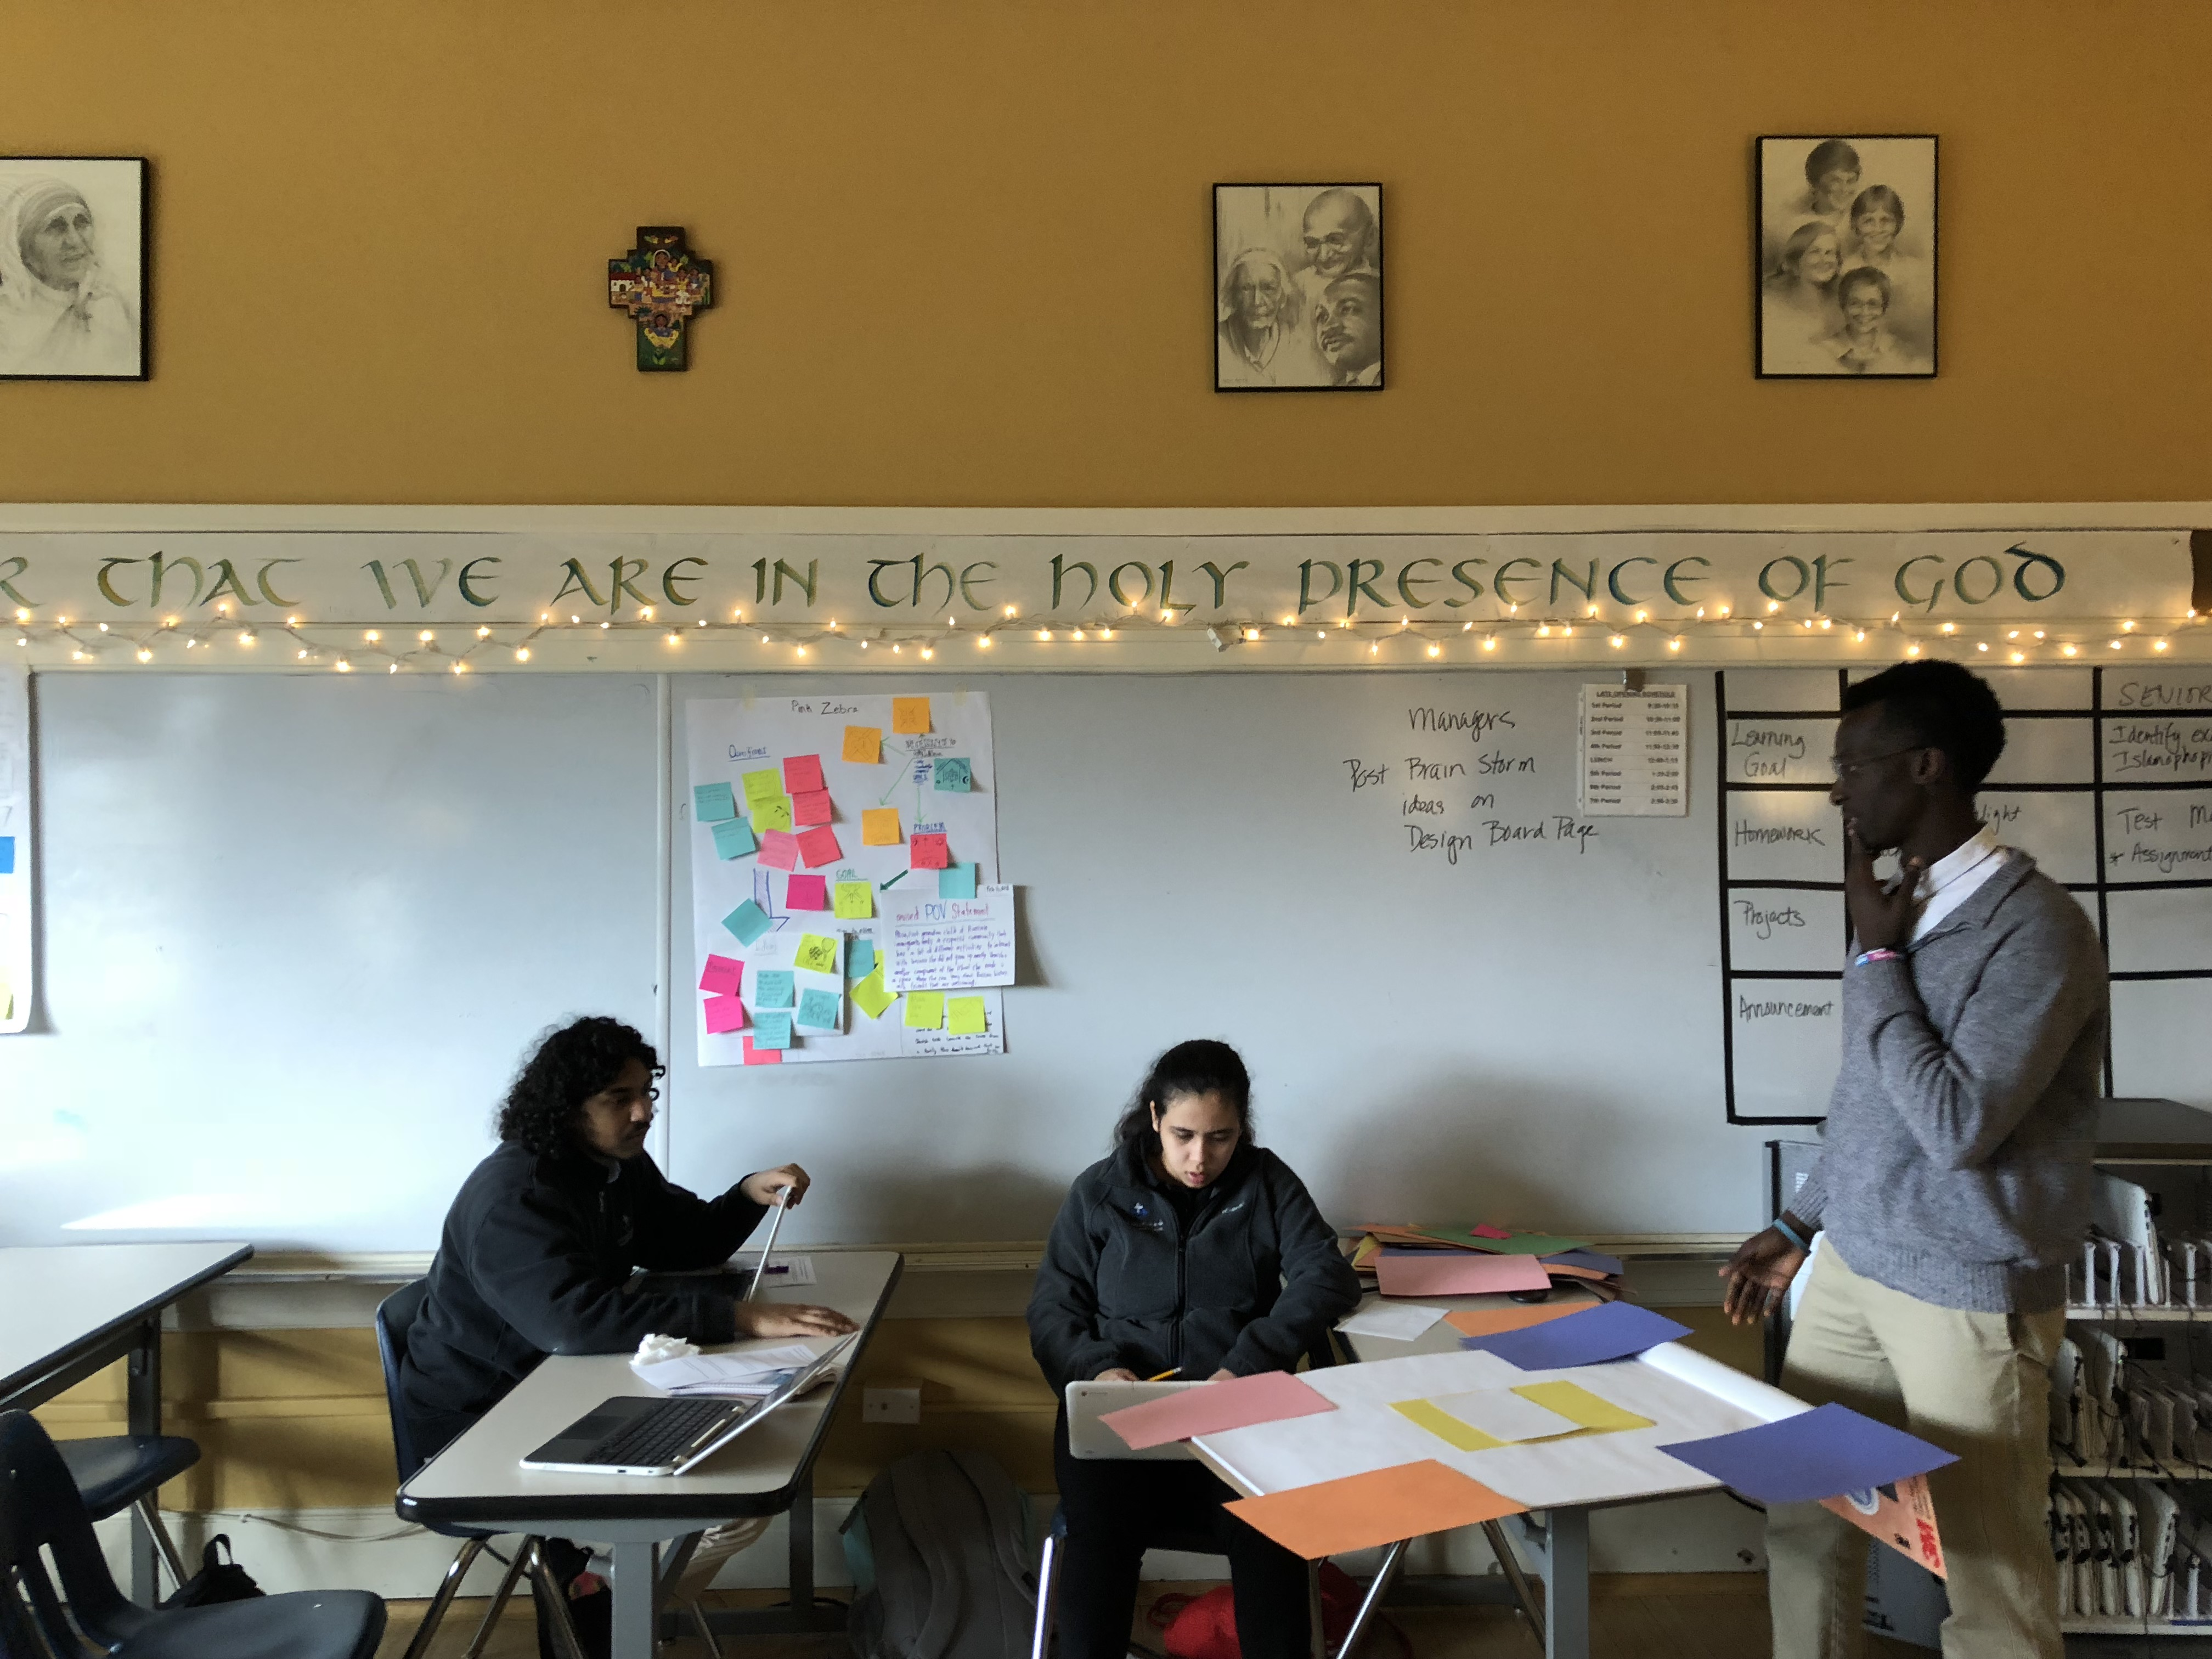 Photo courtesy of De La Salle North Catholic High School in Portland, Oregon